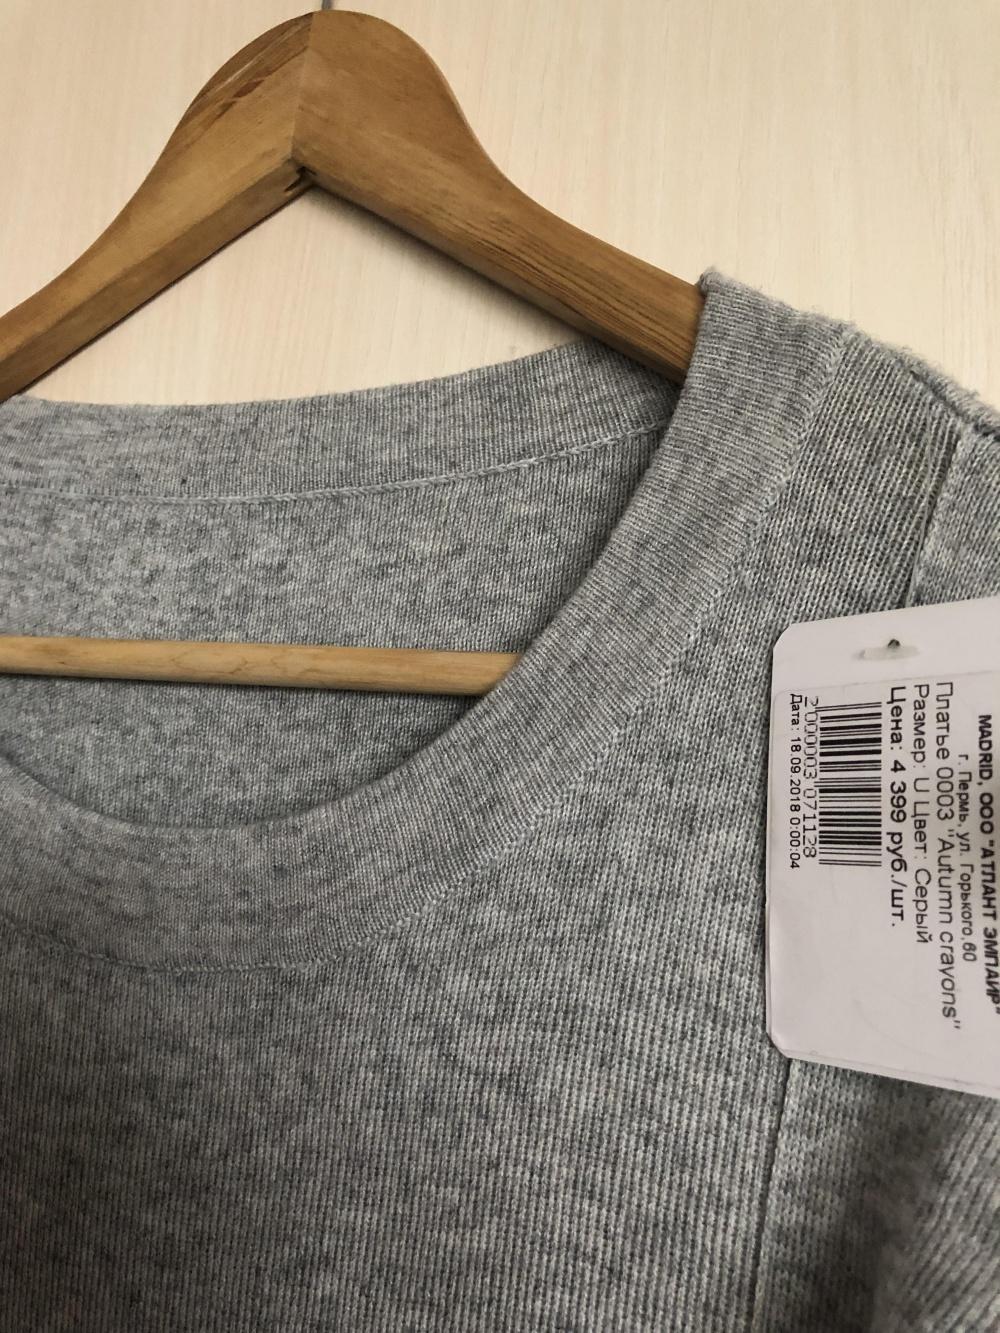 Платье No Name (размер U, RUS 42-46)